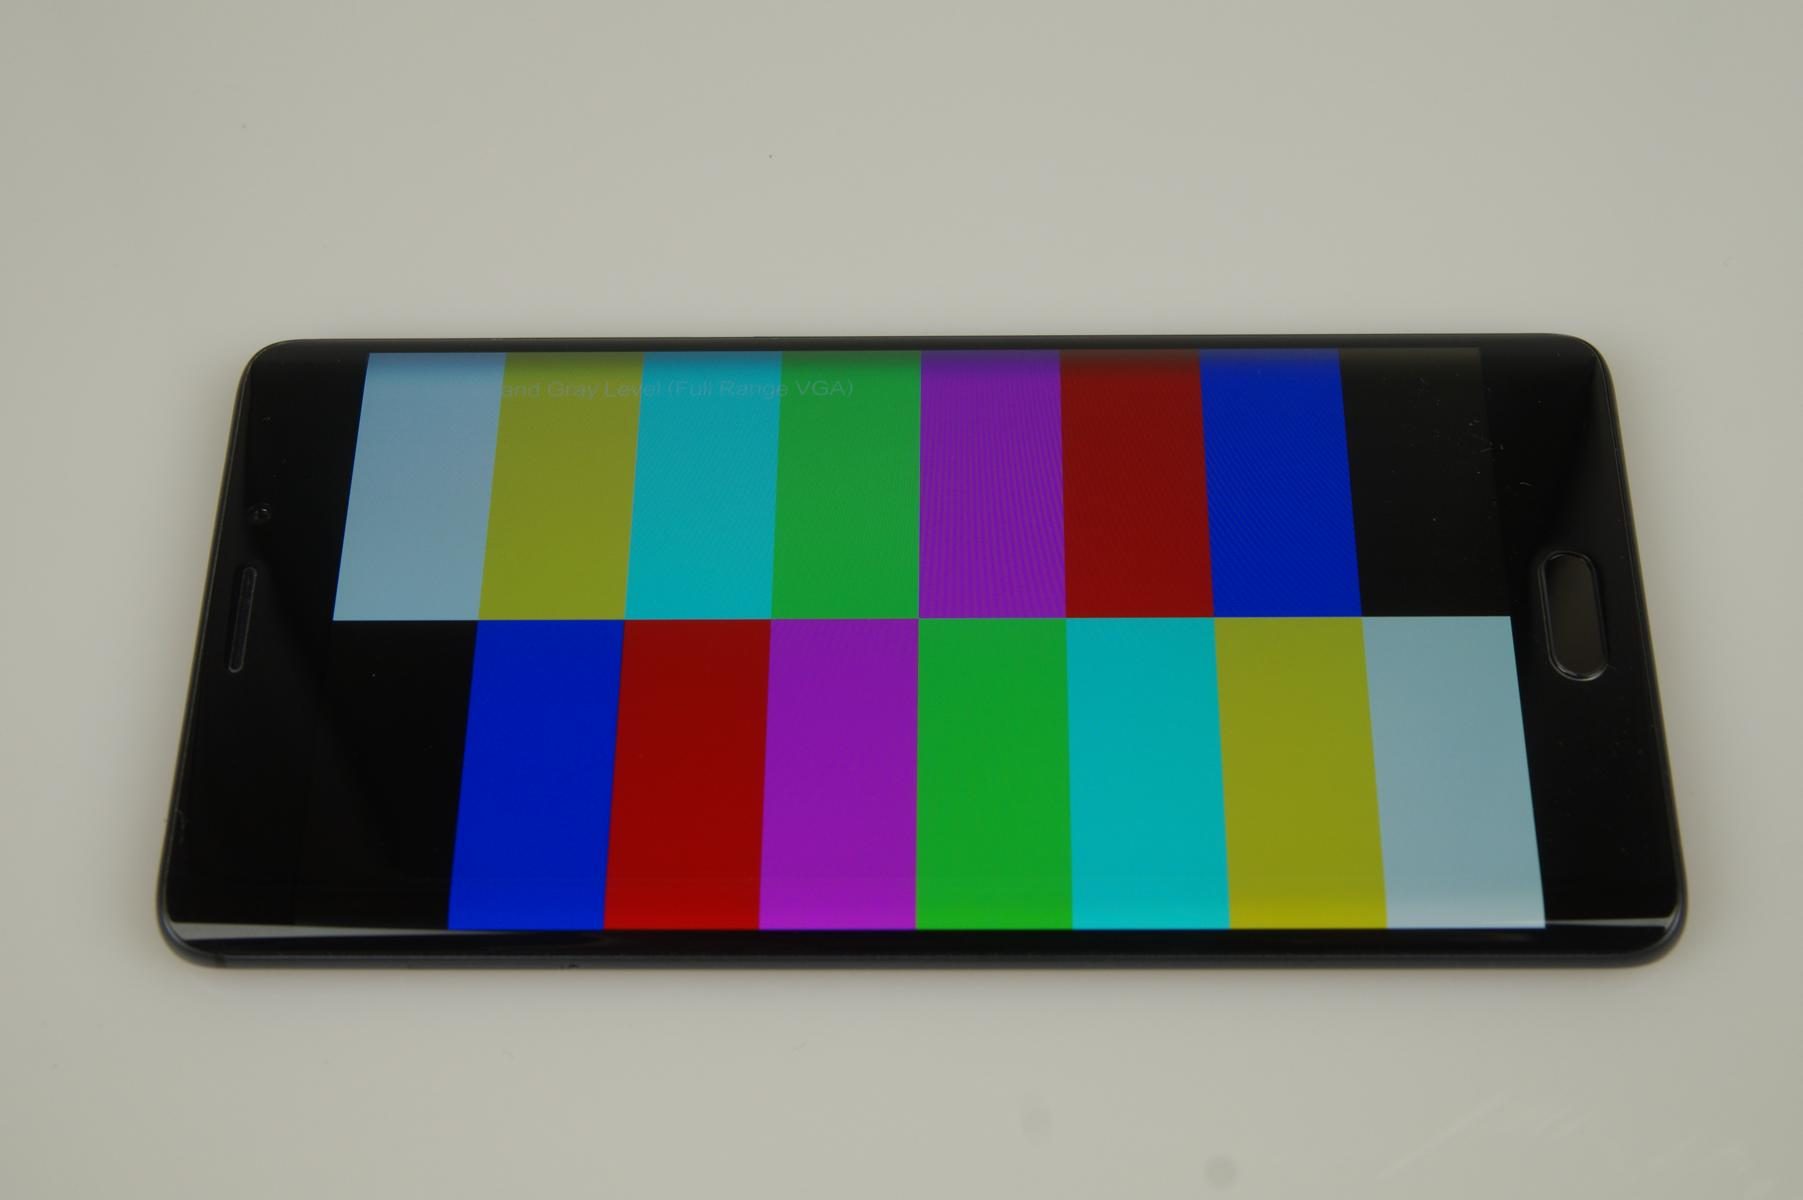 xiaomi-mi-note-2-curved-display-8